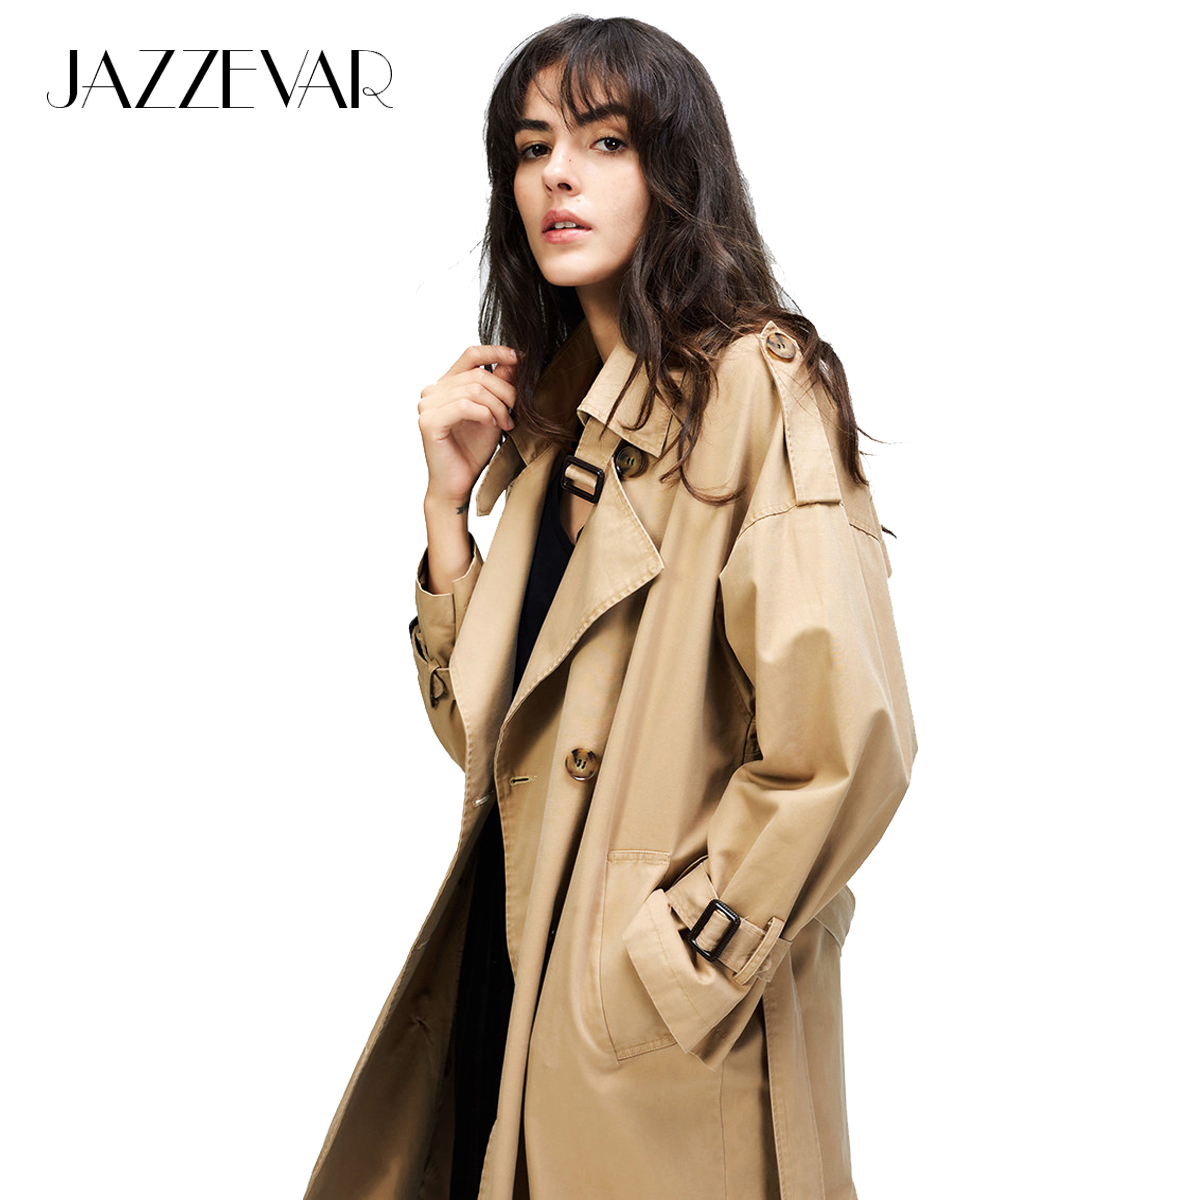 JAZZEVAR 2019 otoño nueva mujer Casual gabardina oversize doble Breasted Vintage lavado ropa suelta